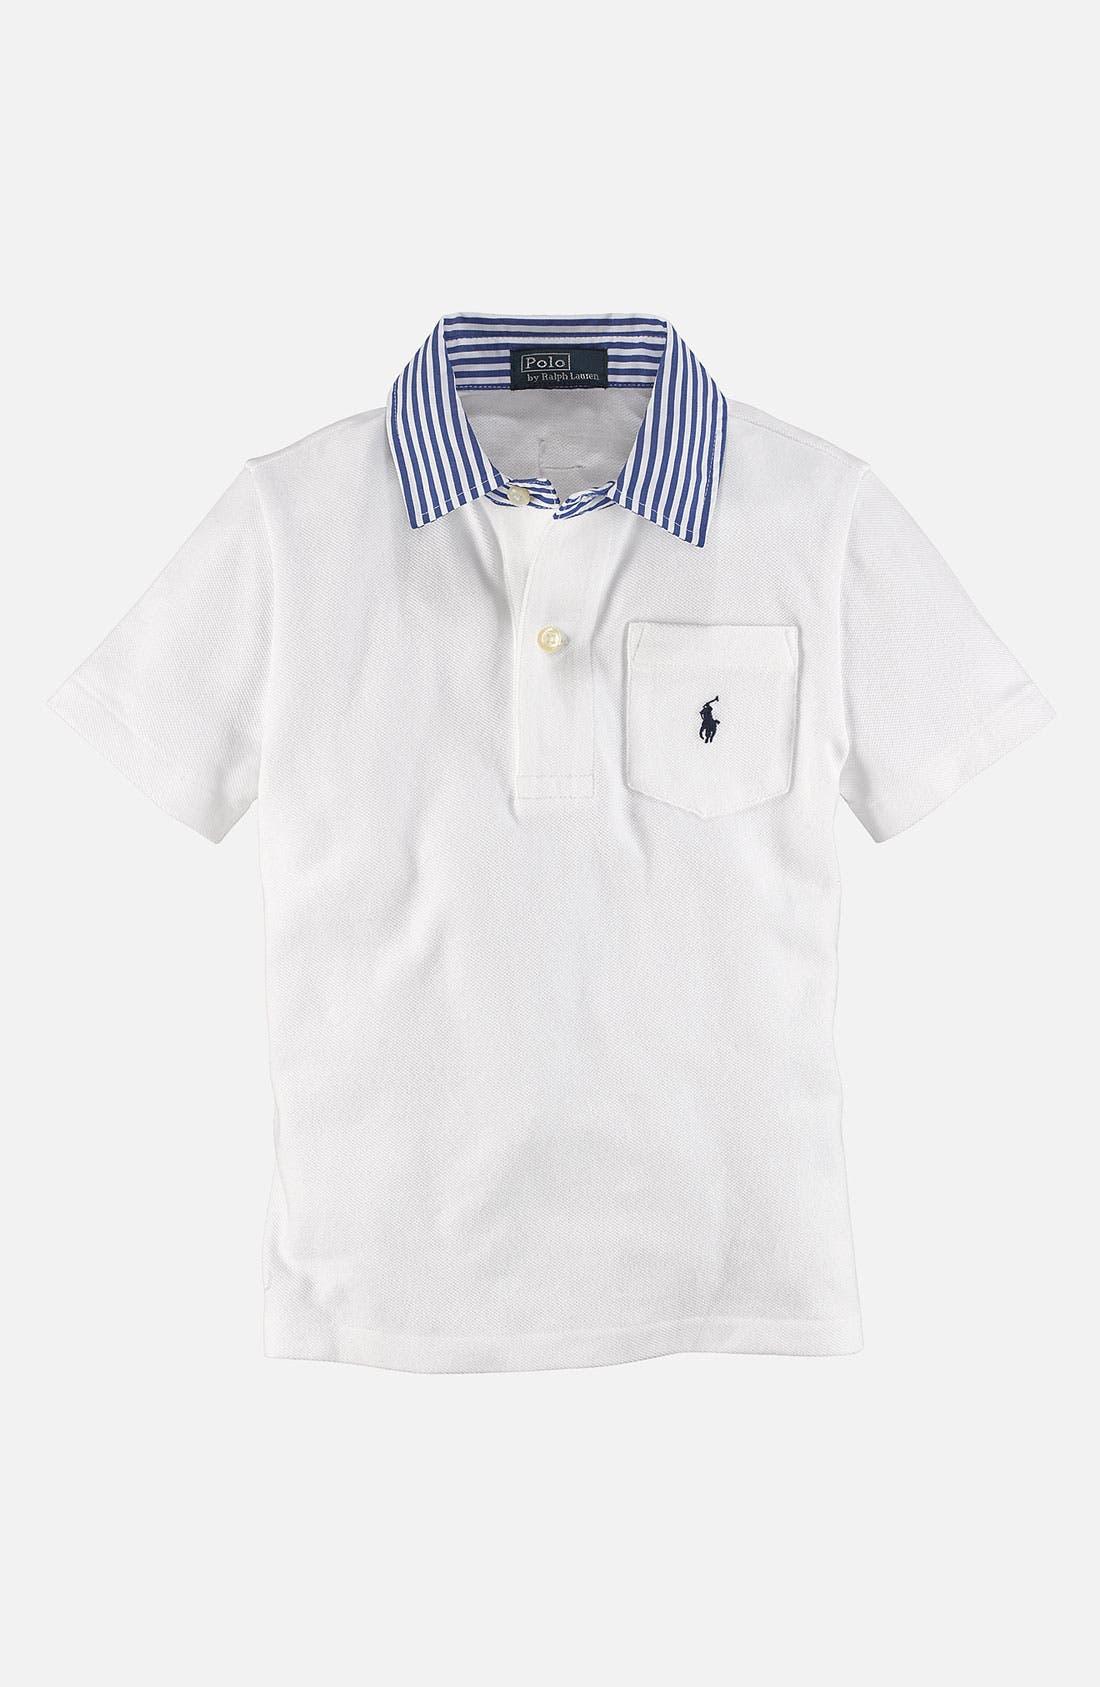 Main Image - Ralph Lauren Polo Shirt (Toddler)